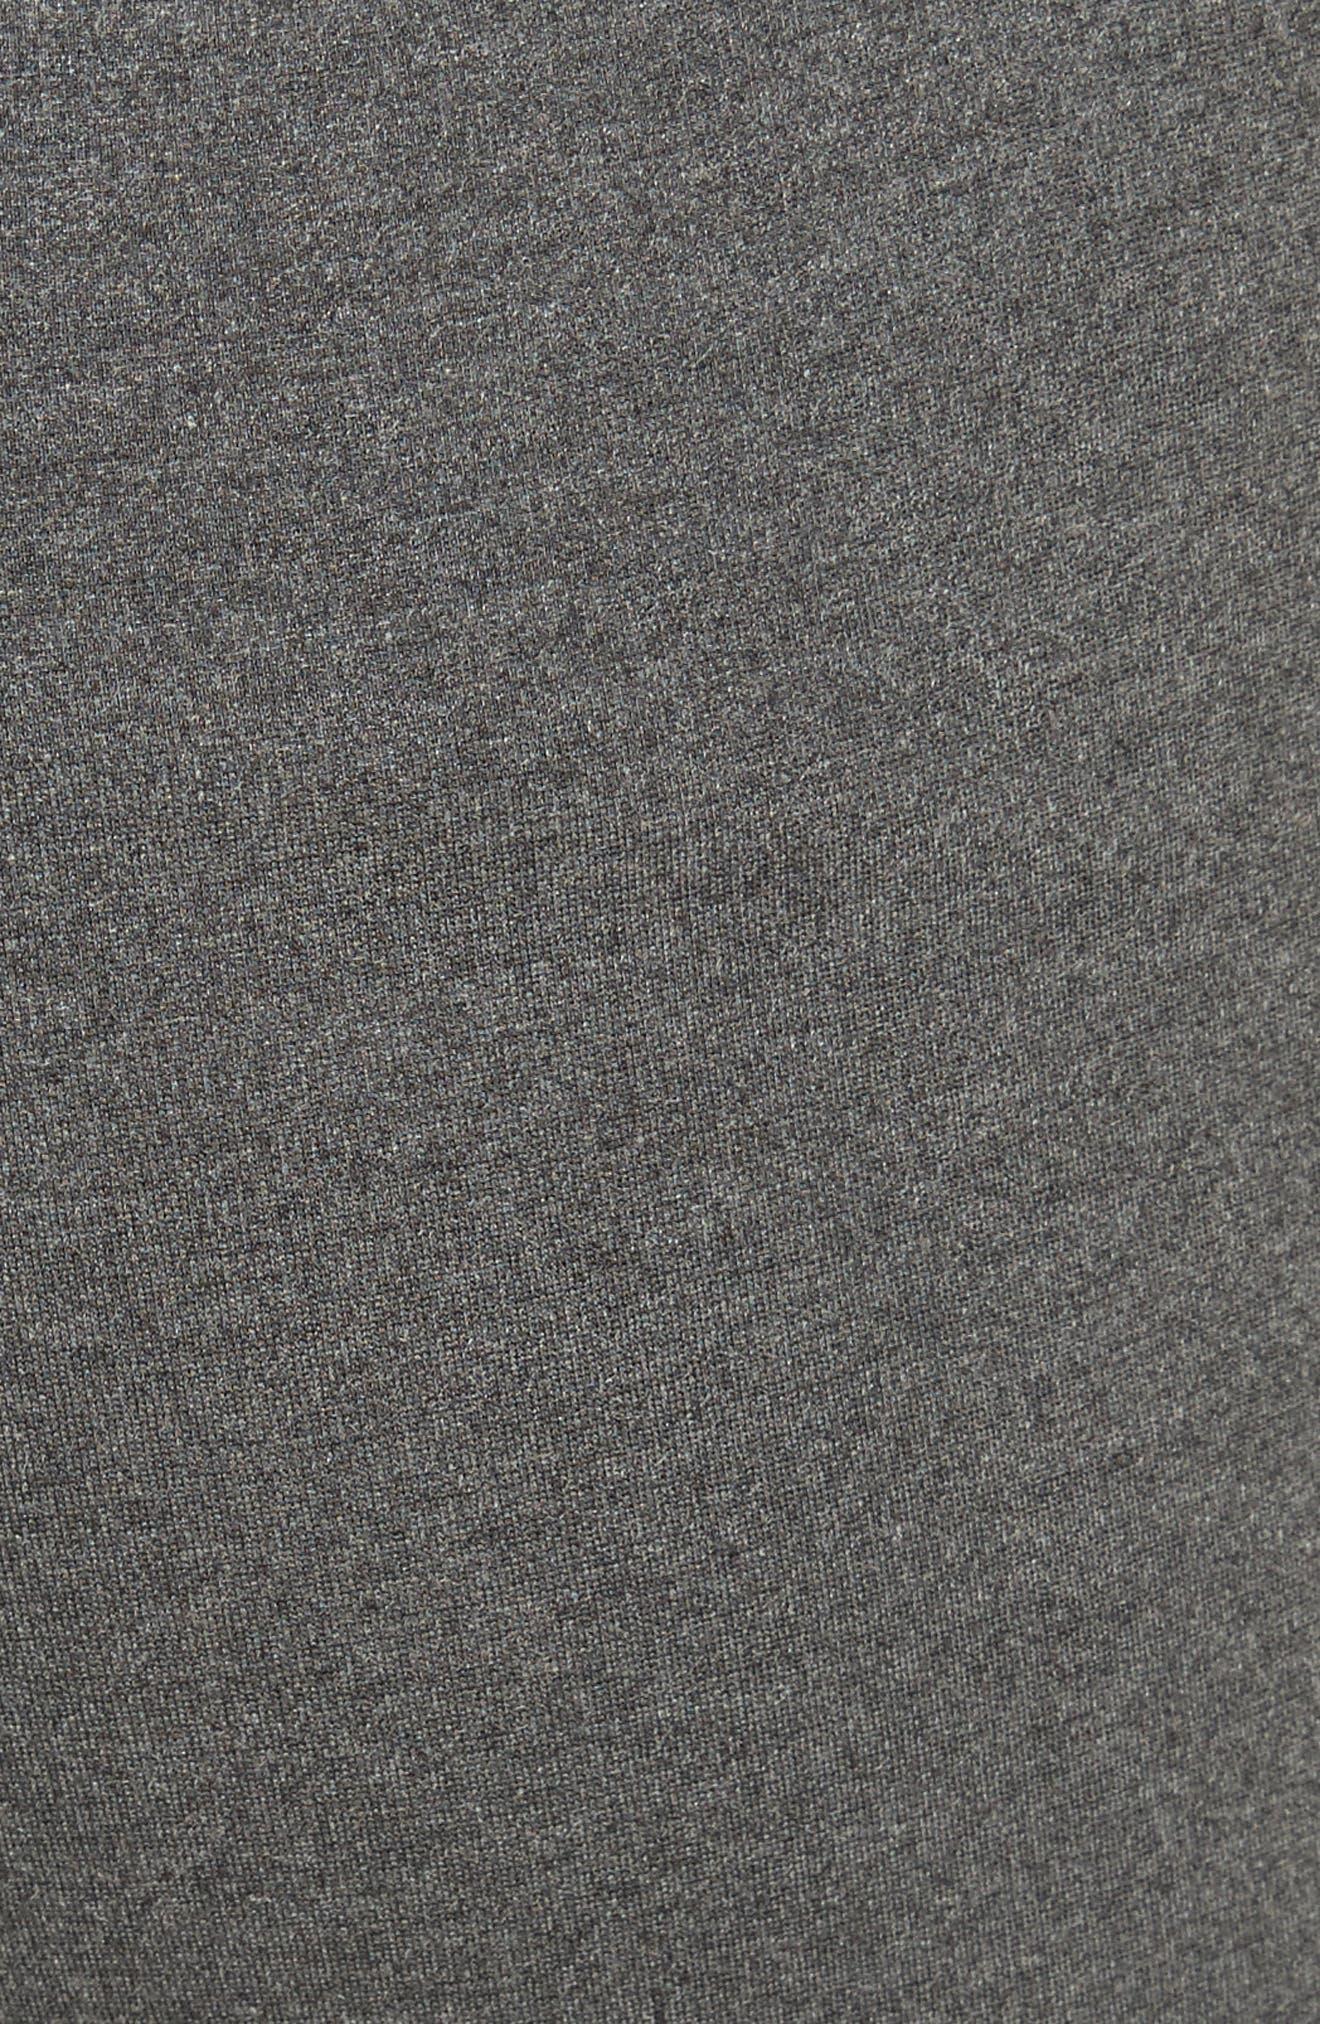 Slim Crop Pants,                             Alternate thumbnail 5, color,                             CHARCOAL